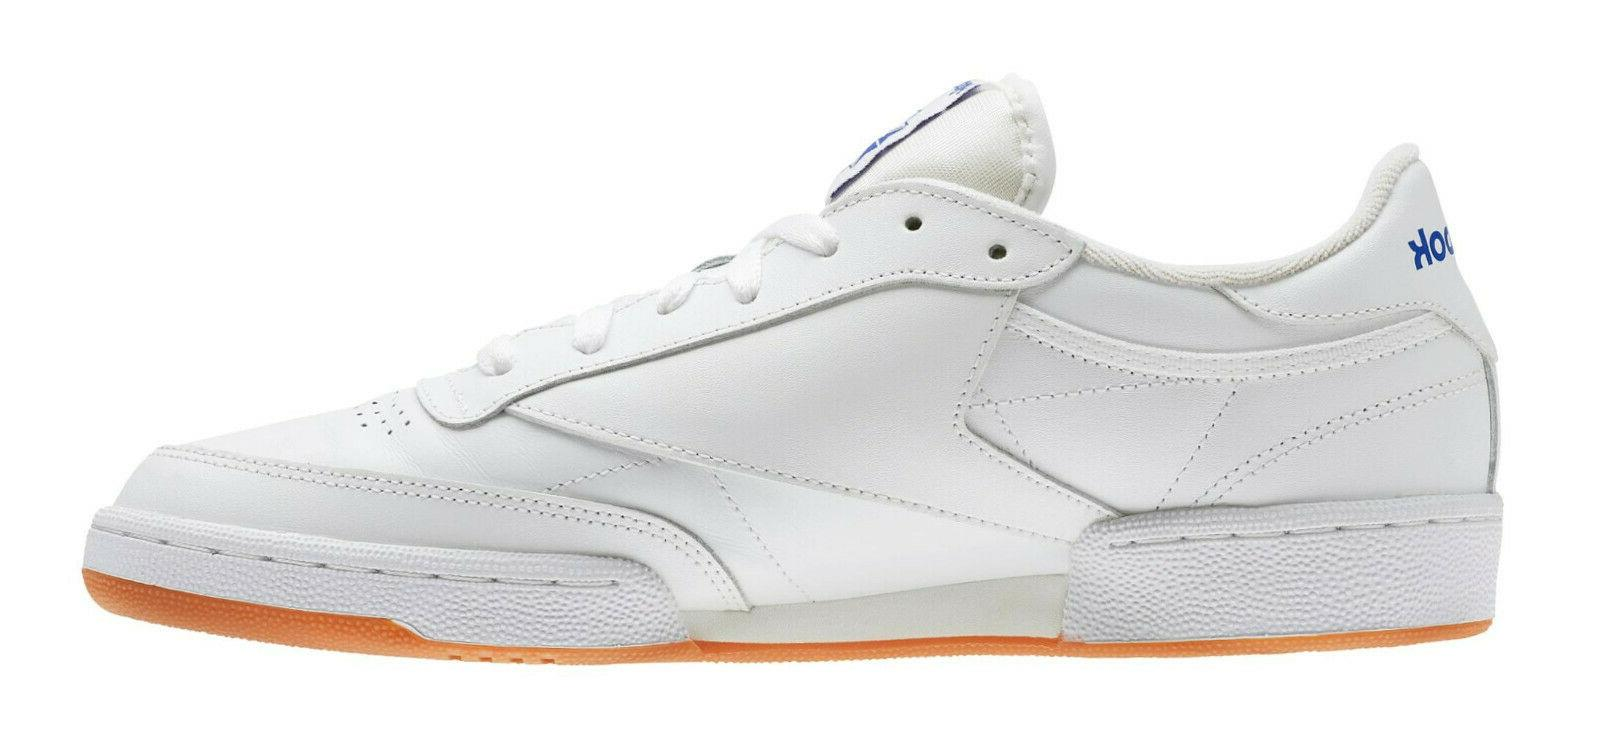 Reebok 85 Royal, Gum Mens Sneakers Tennis